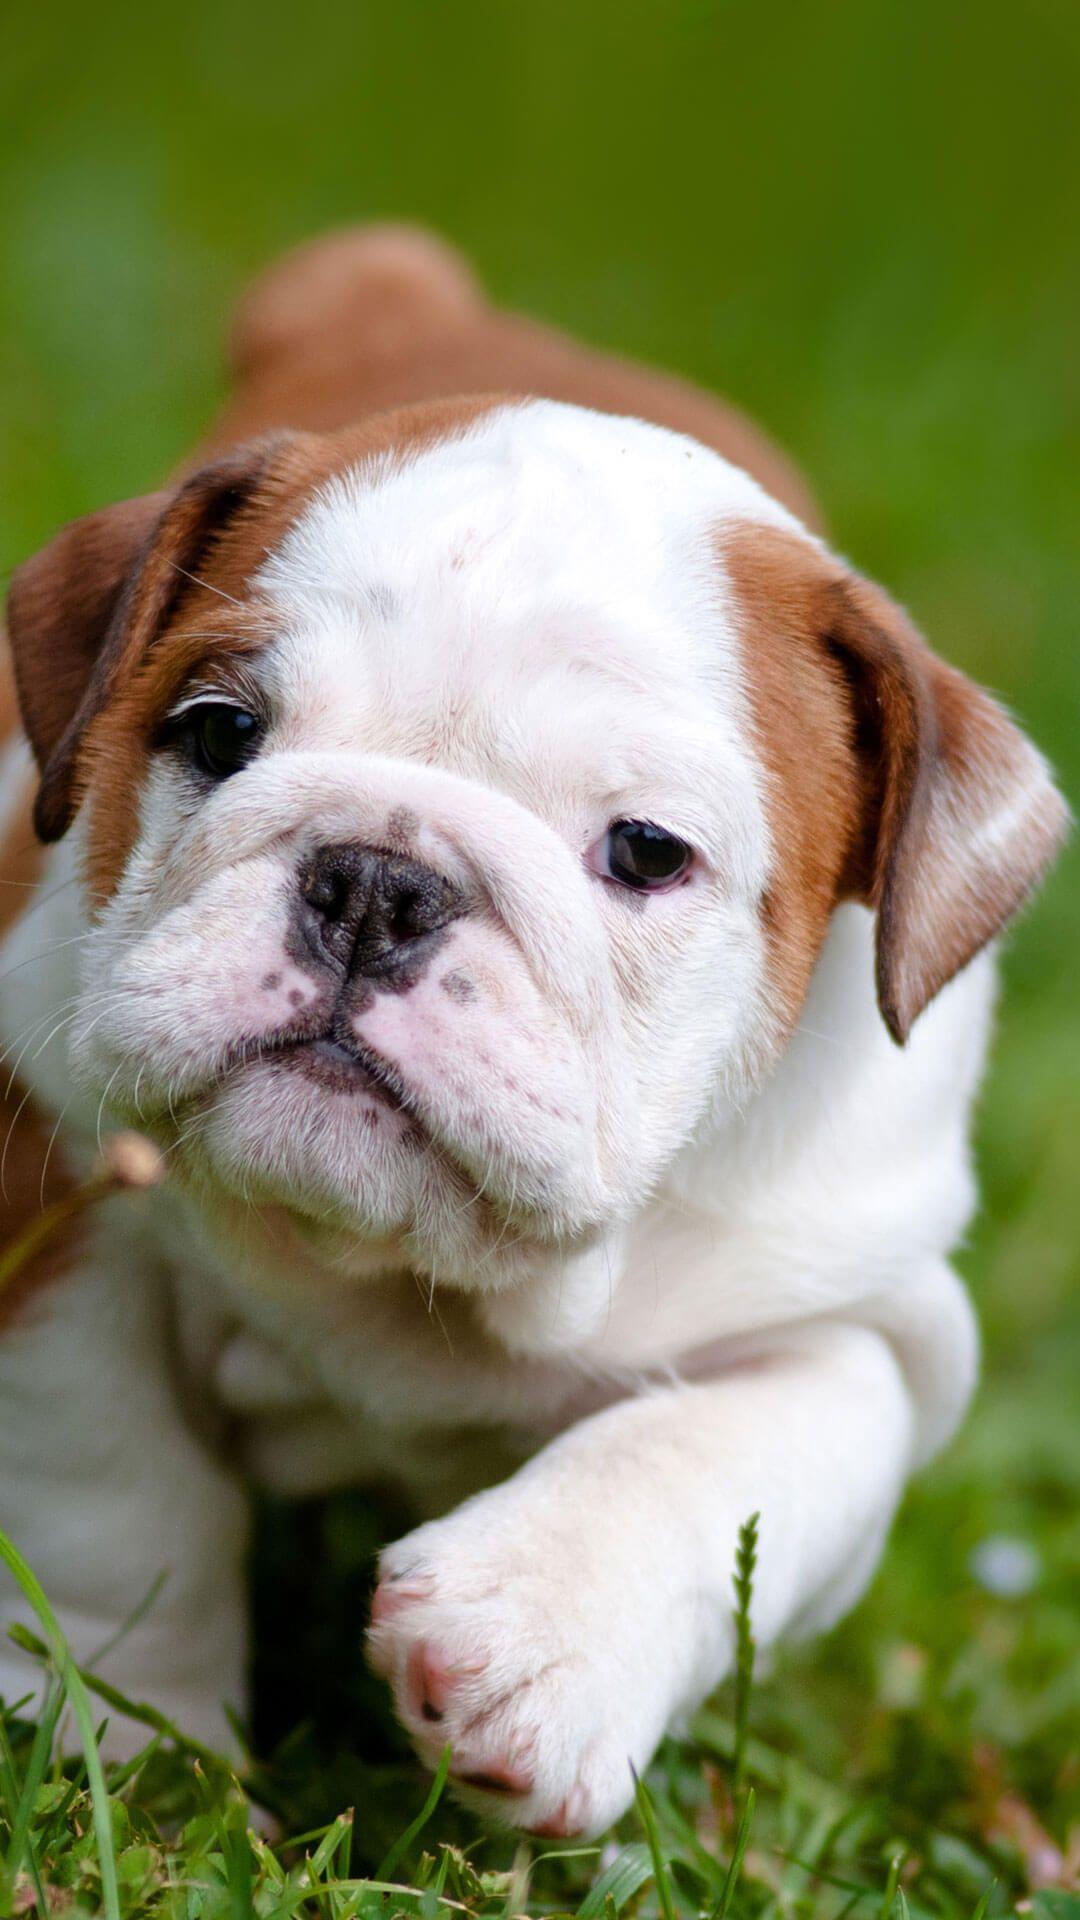 Puppy Wallpaper For Bedroom Cute English Bulldog Puppies Iphone Wallpaper Hd Animal